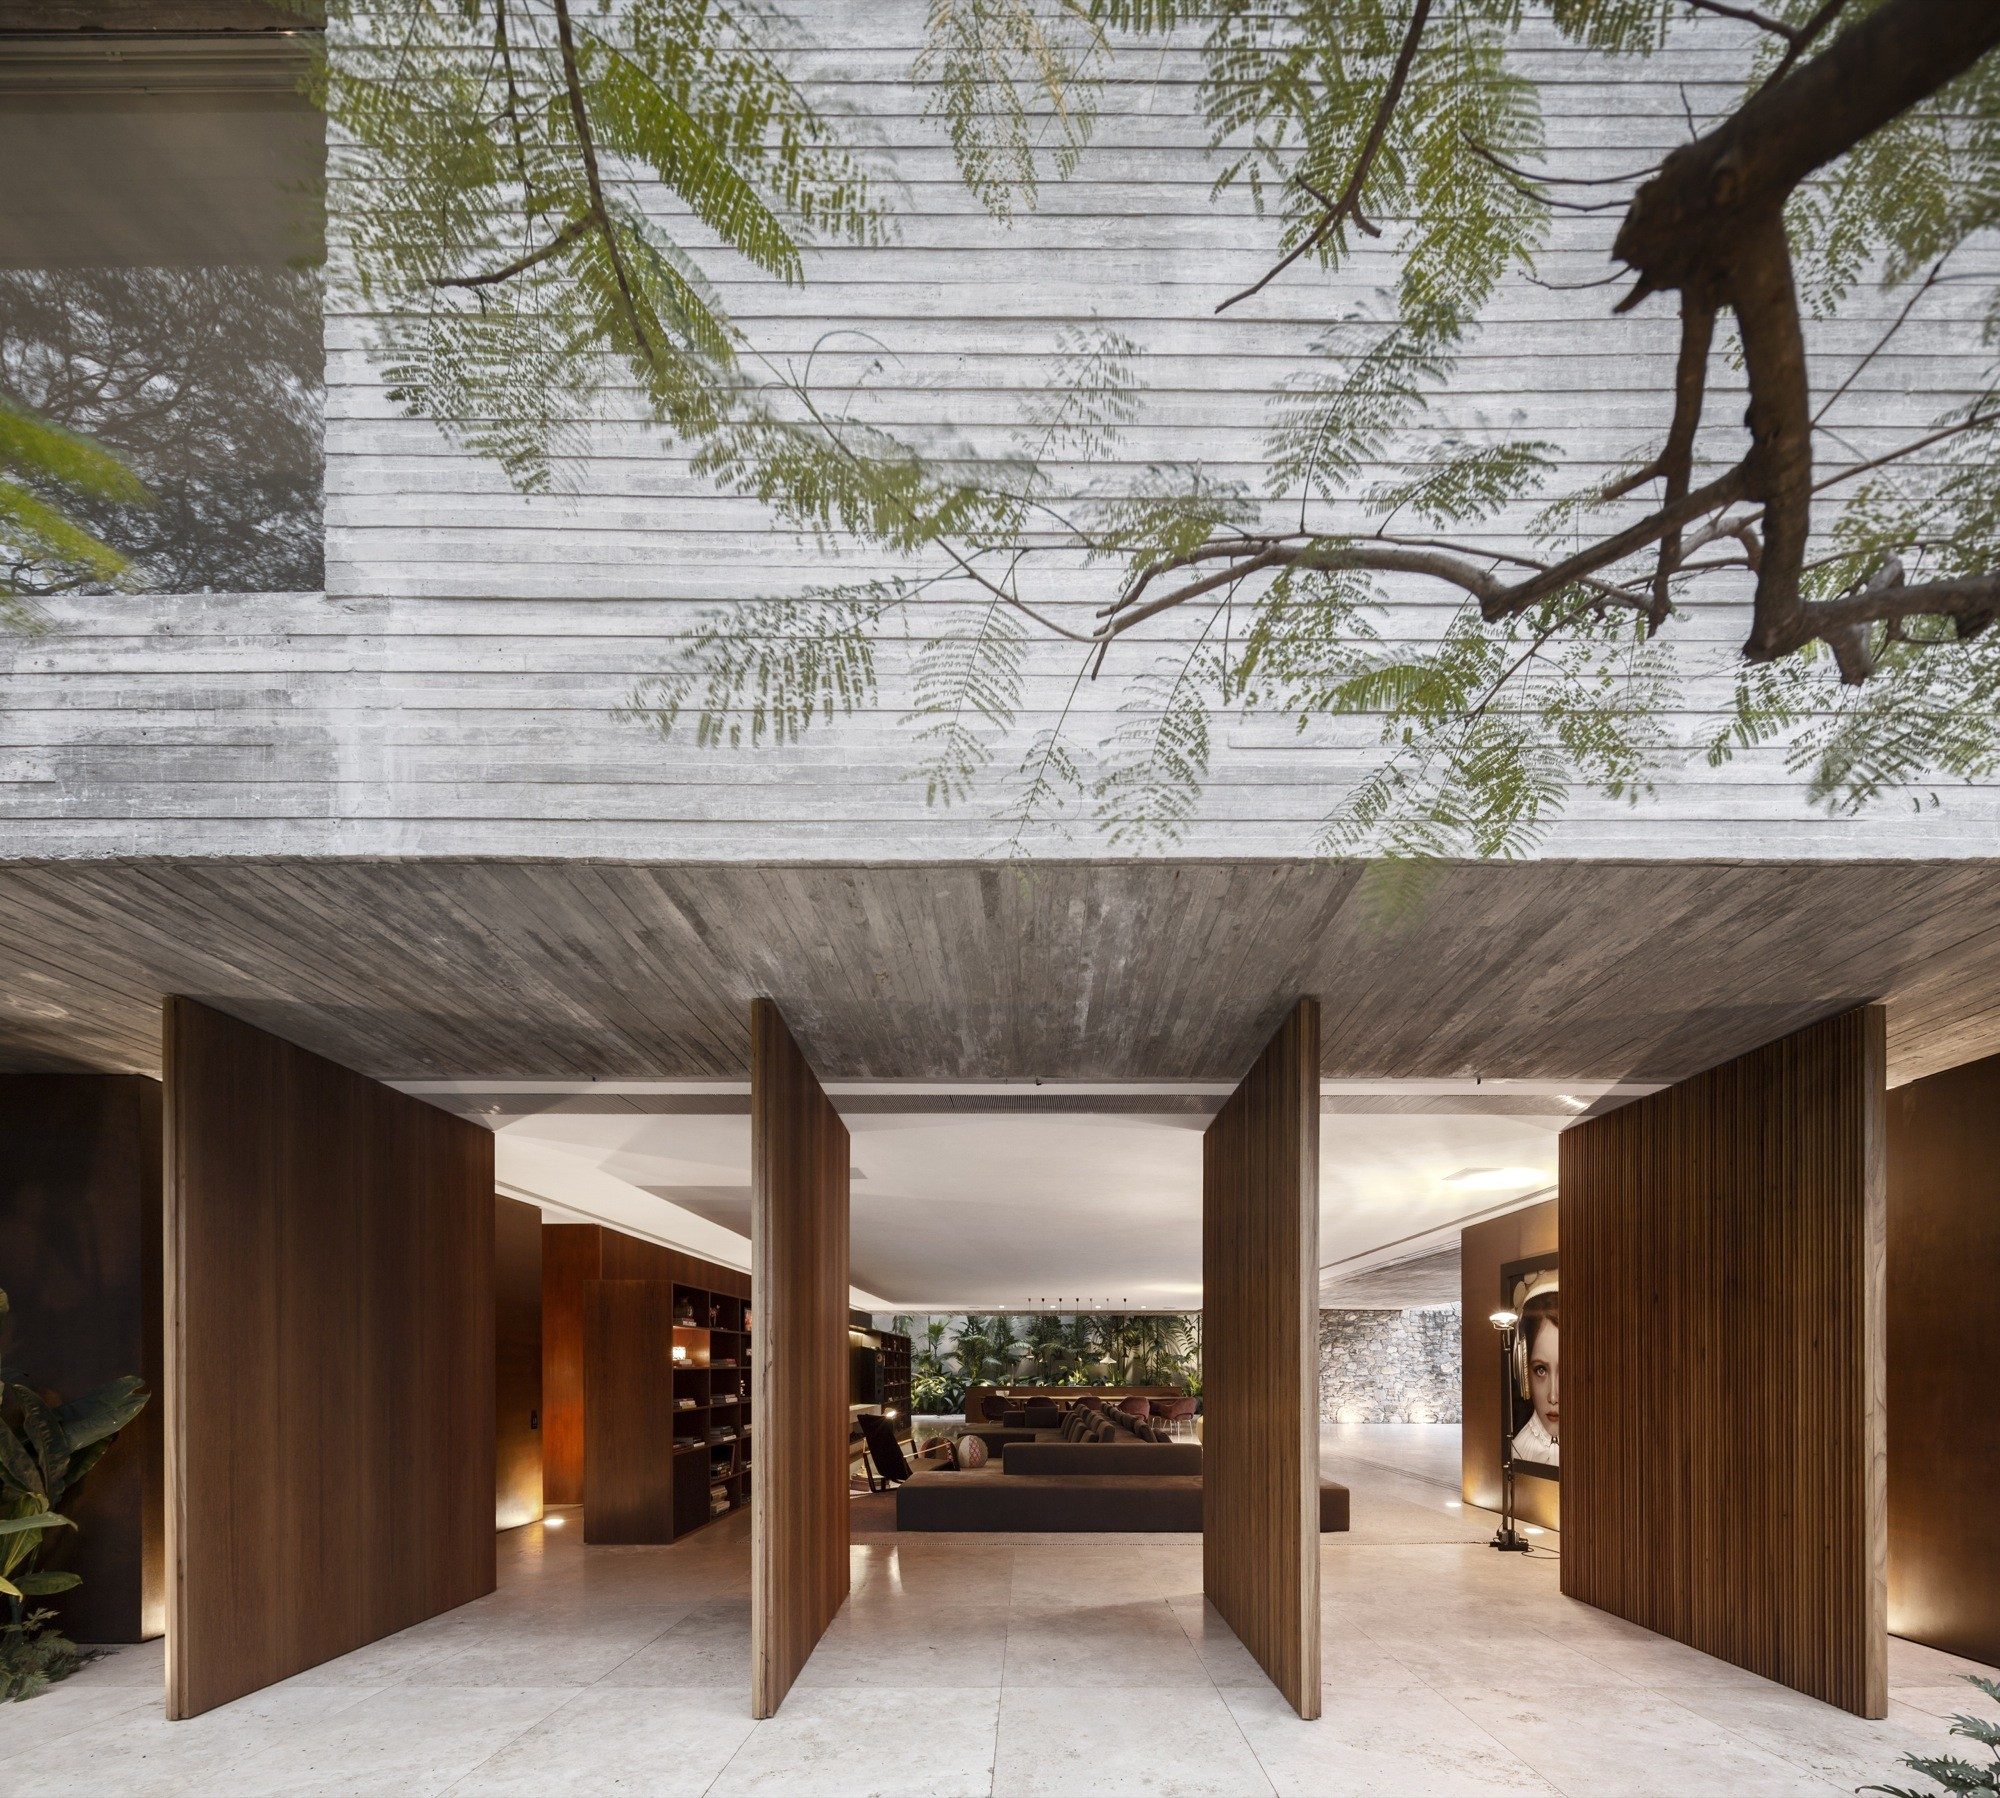 Casa Ipes / Studio MK27 - Marcio Kogan + Lair Reis